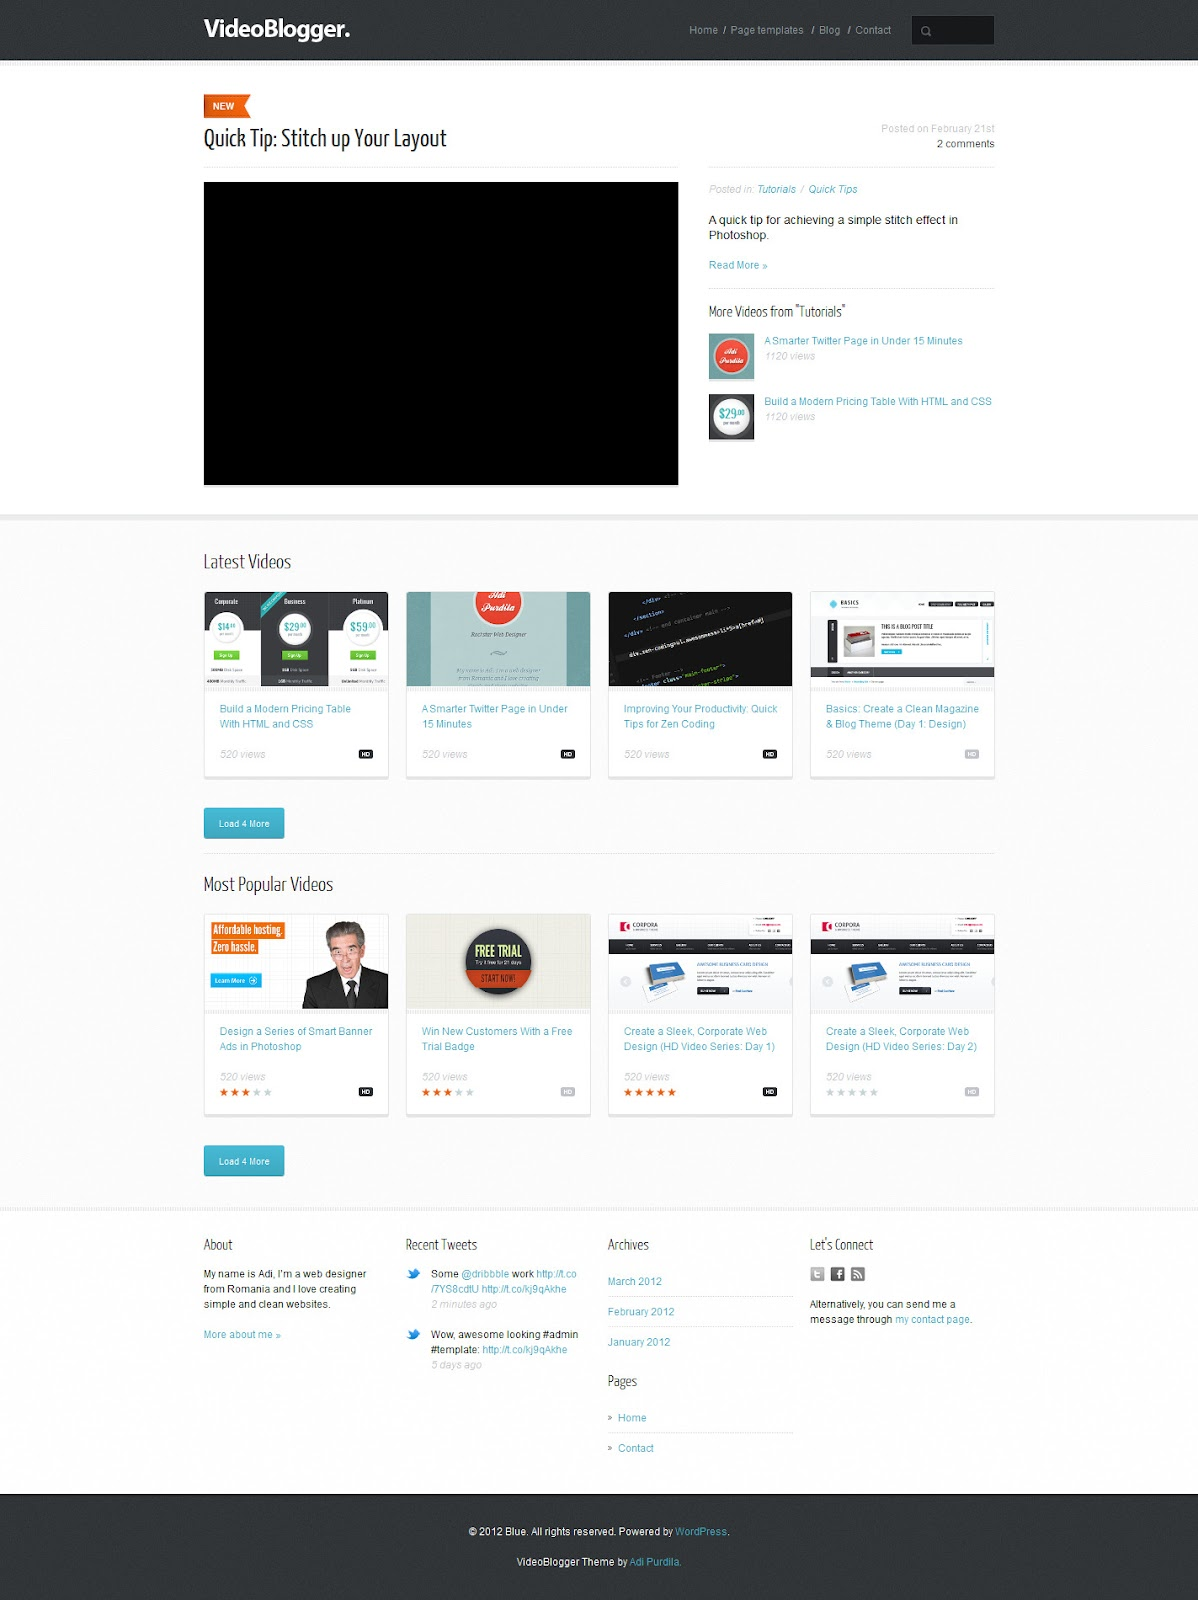 VideoBlogger-Responsive-HTML-Video-Blog-Theme